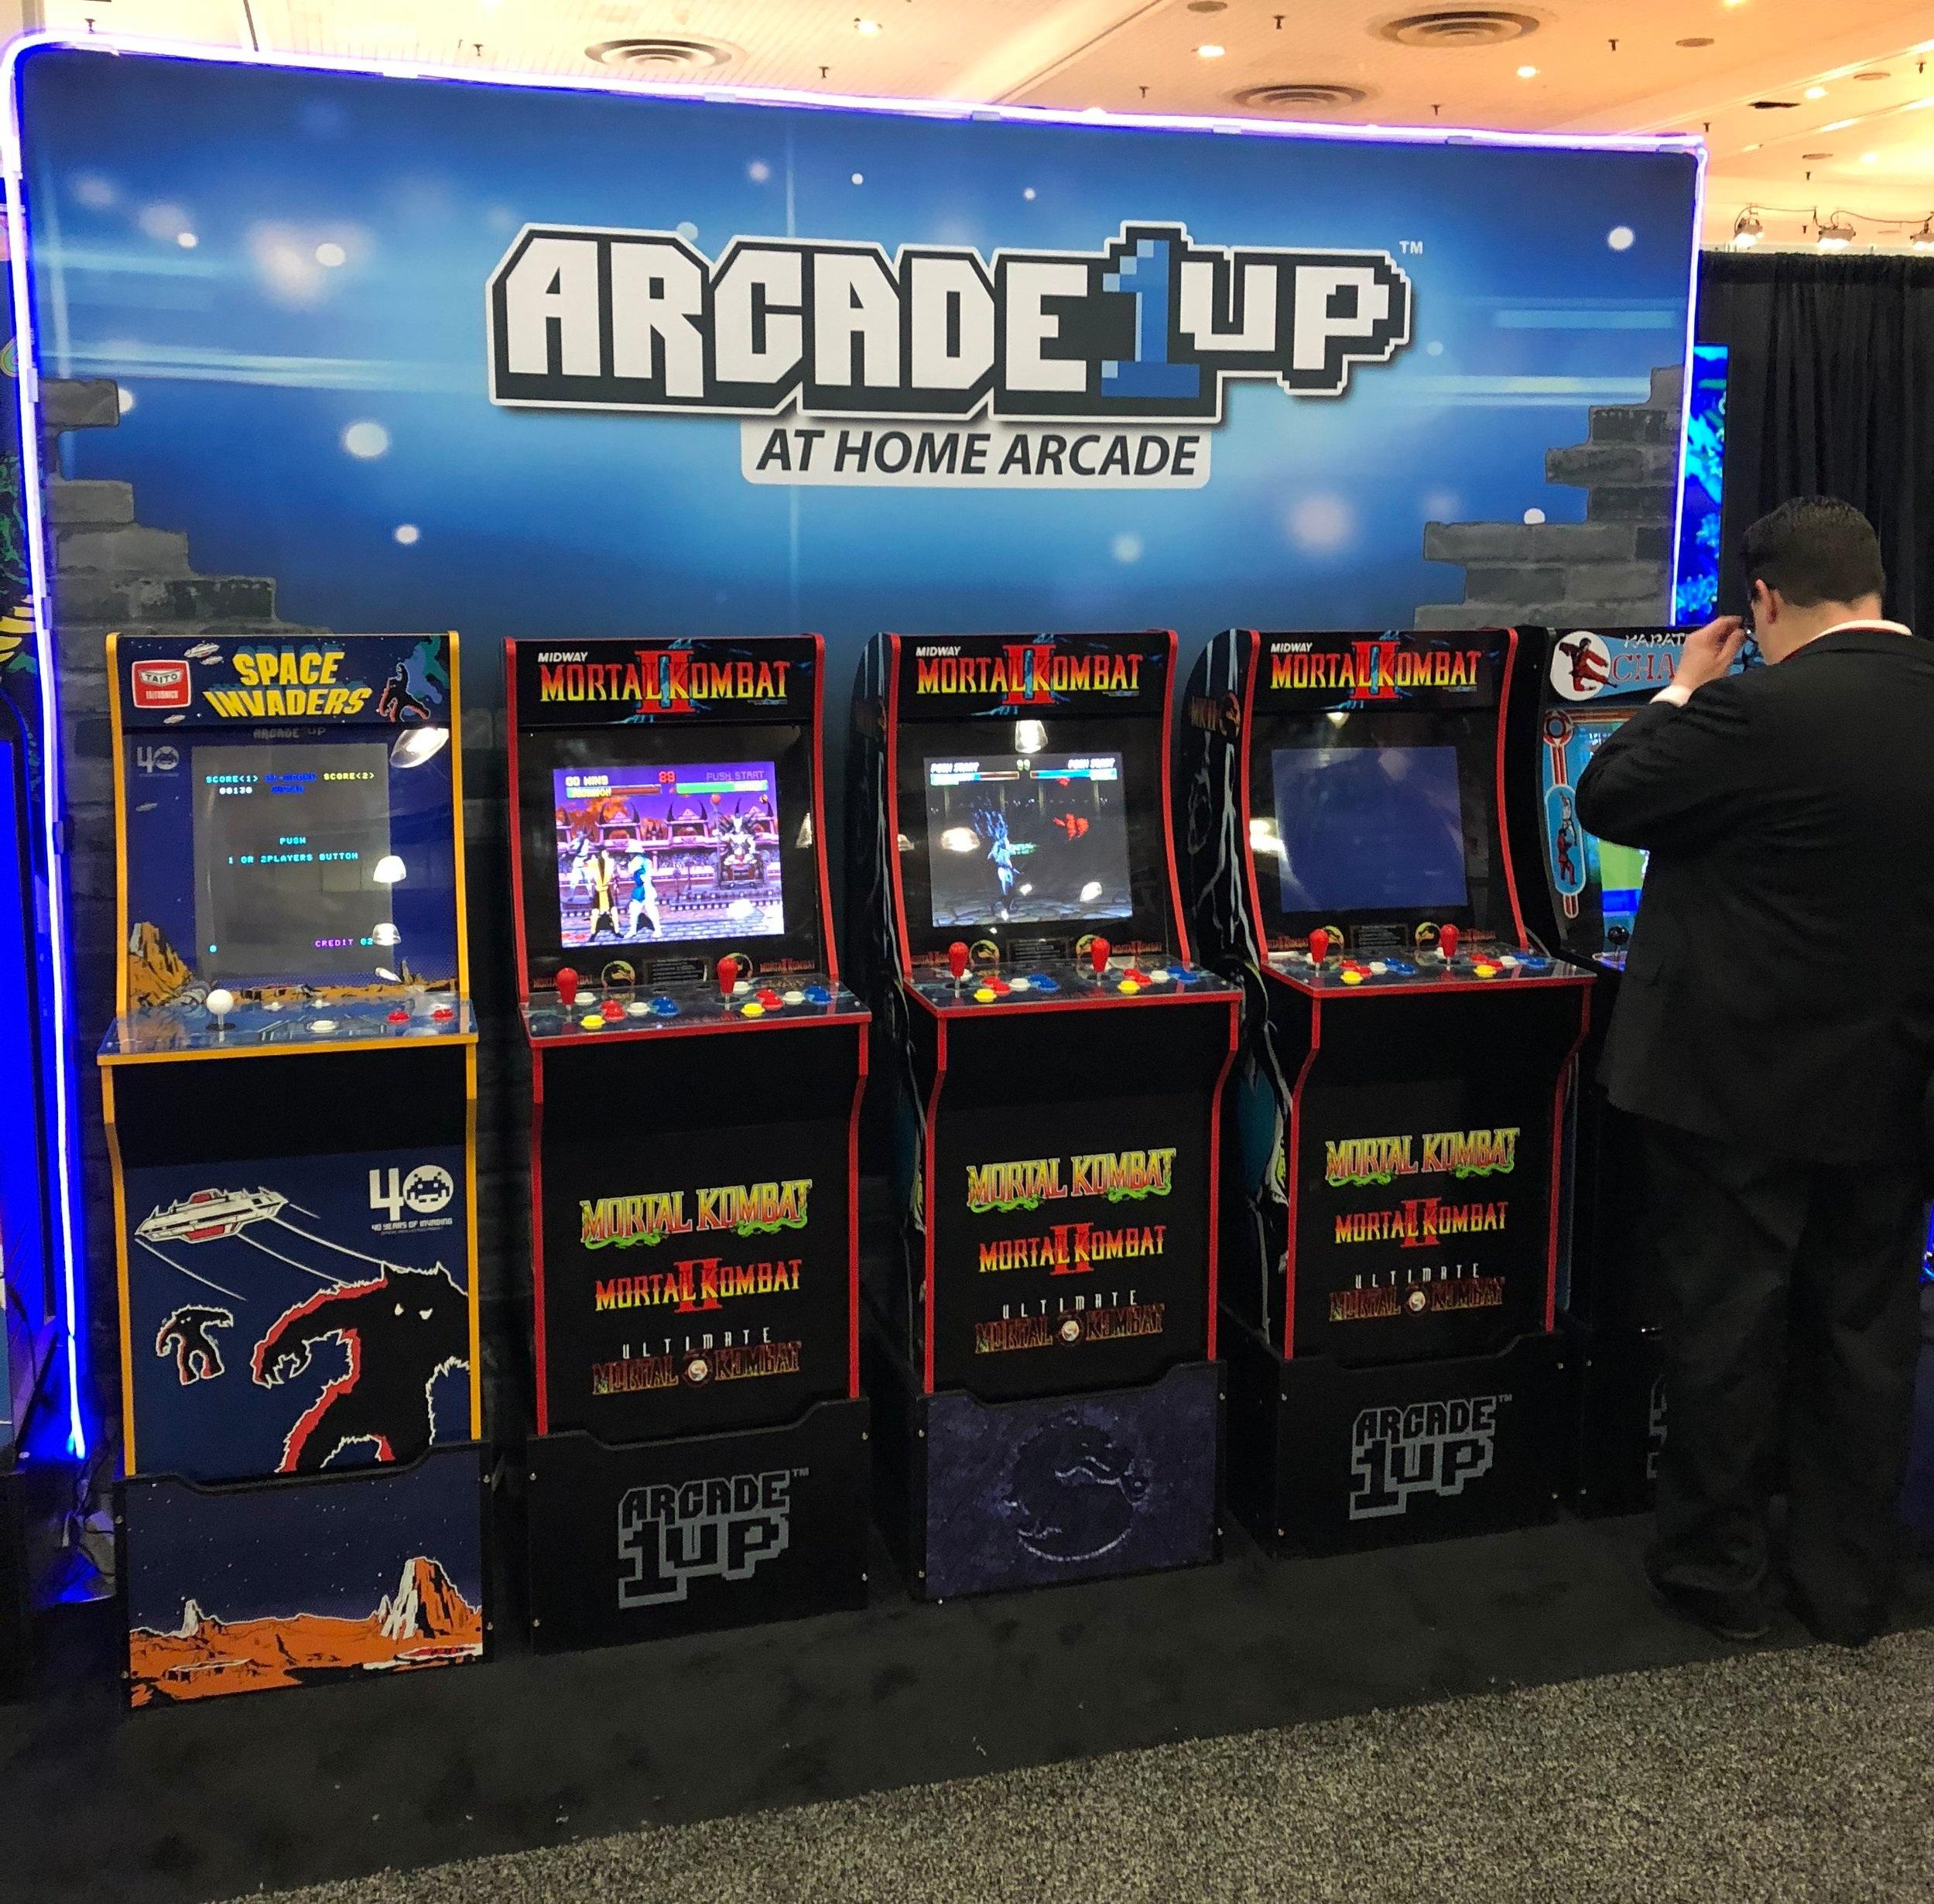 Arcade1up-2.jpg